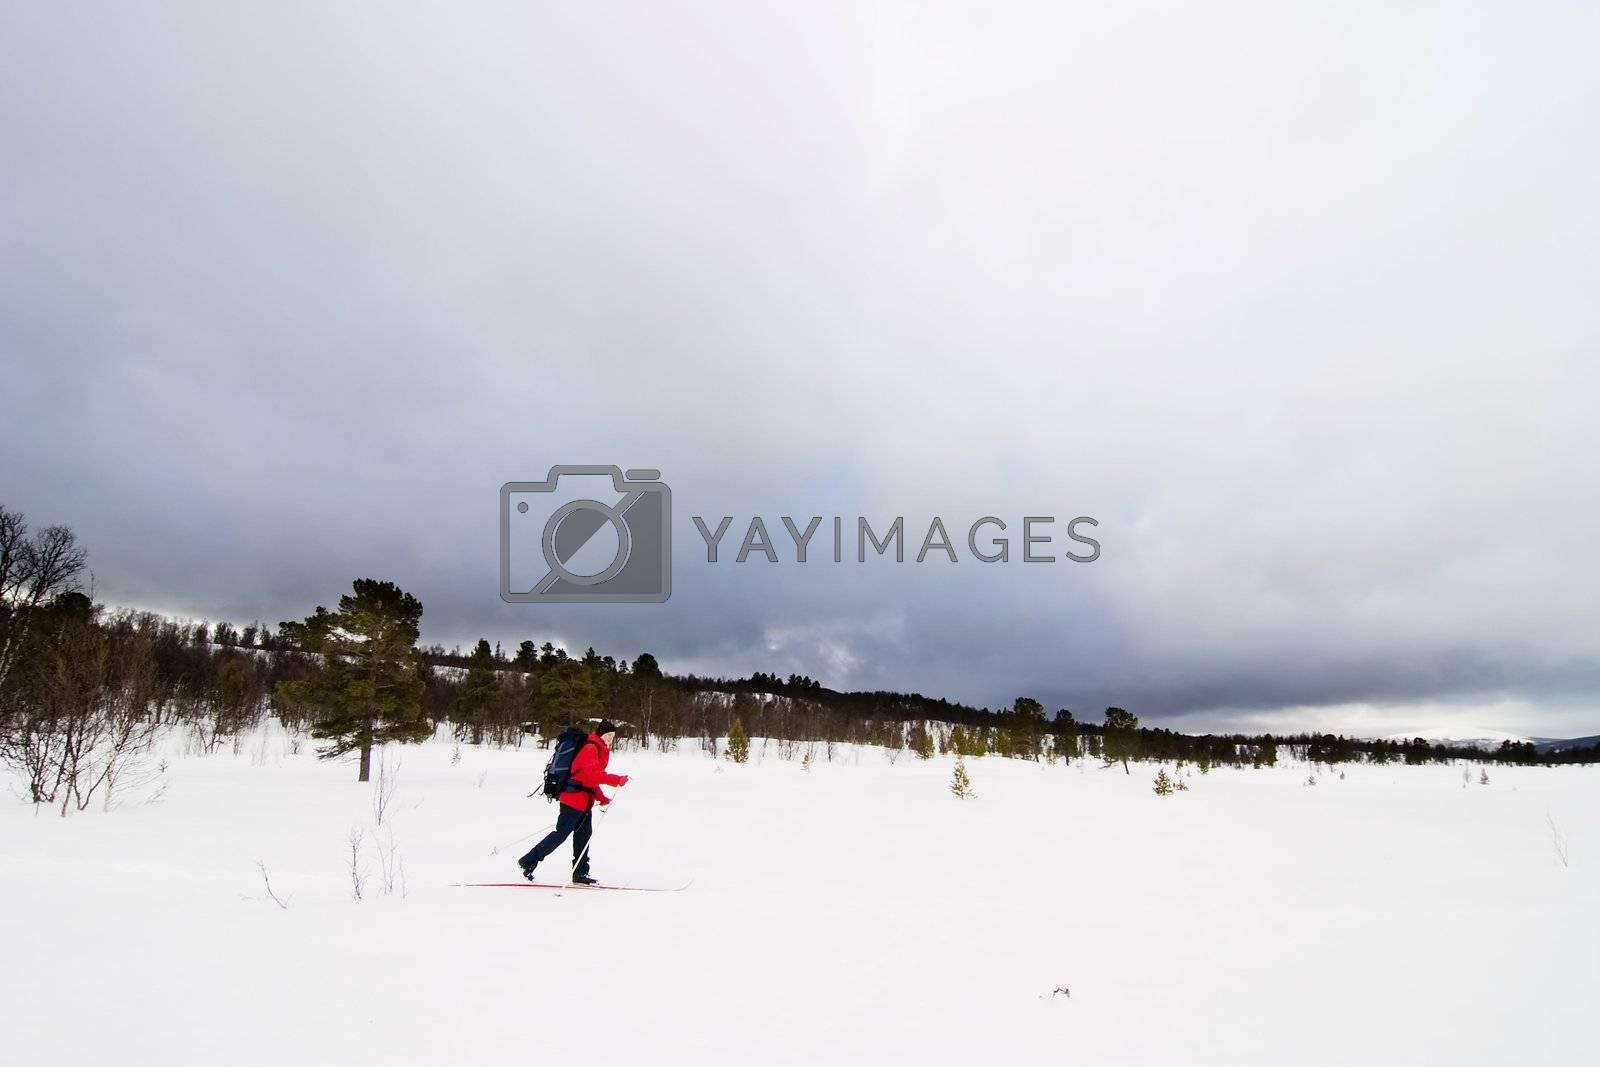 Skiing no a winter landscape